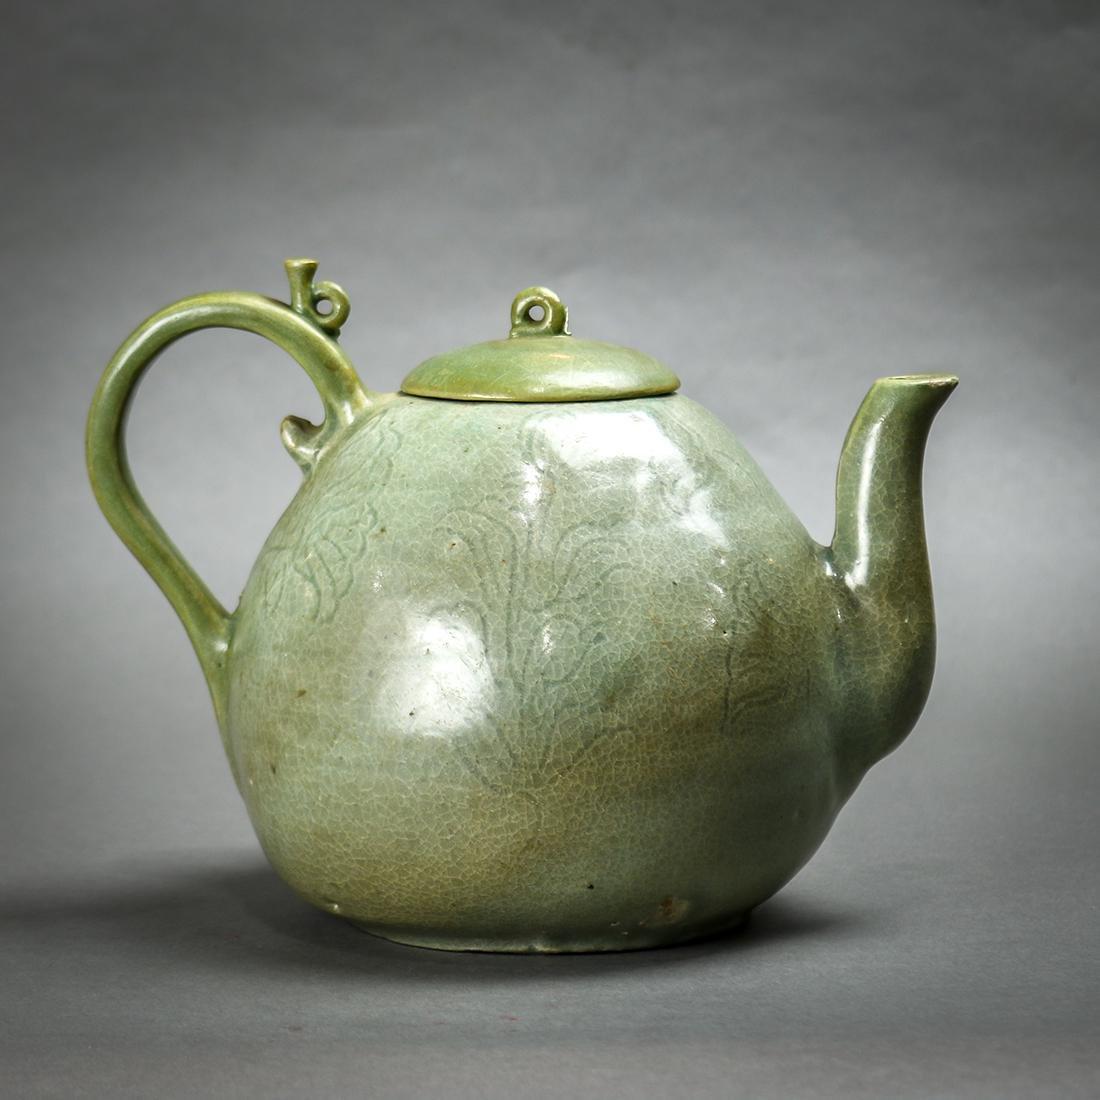 Korean Celadon Ceramic Teapot - 2